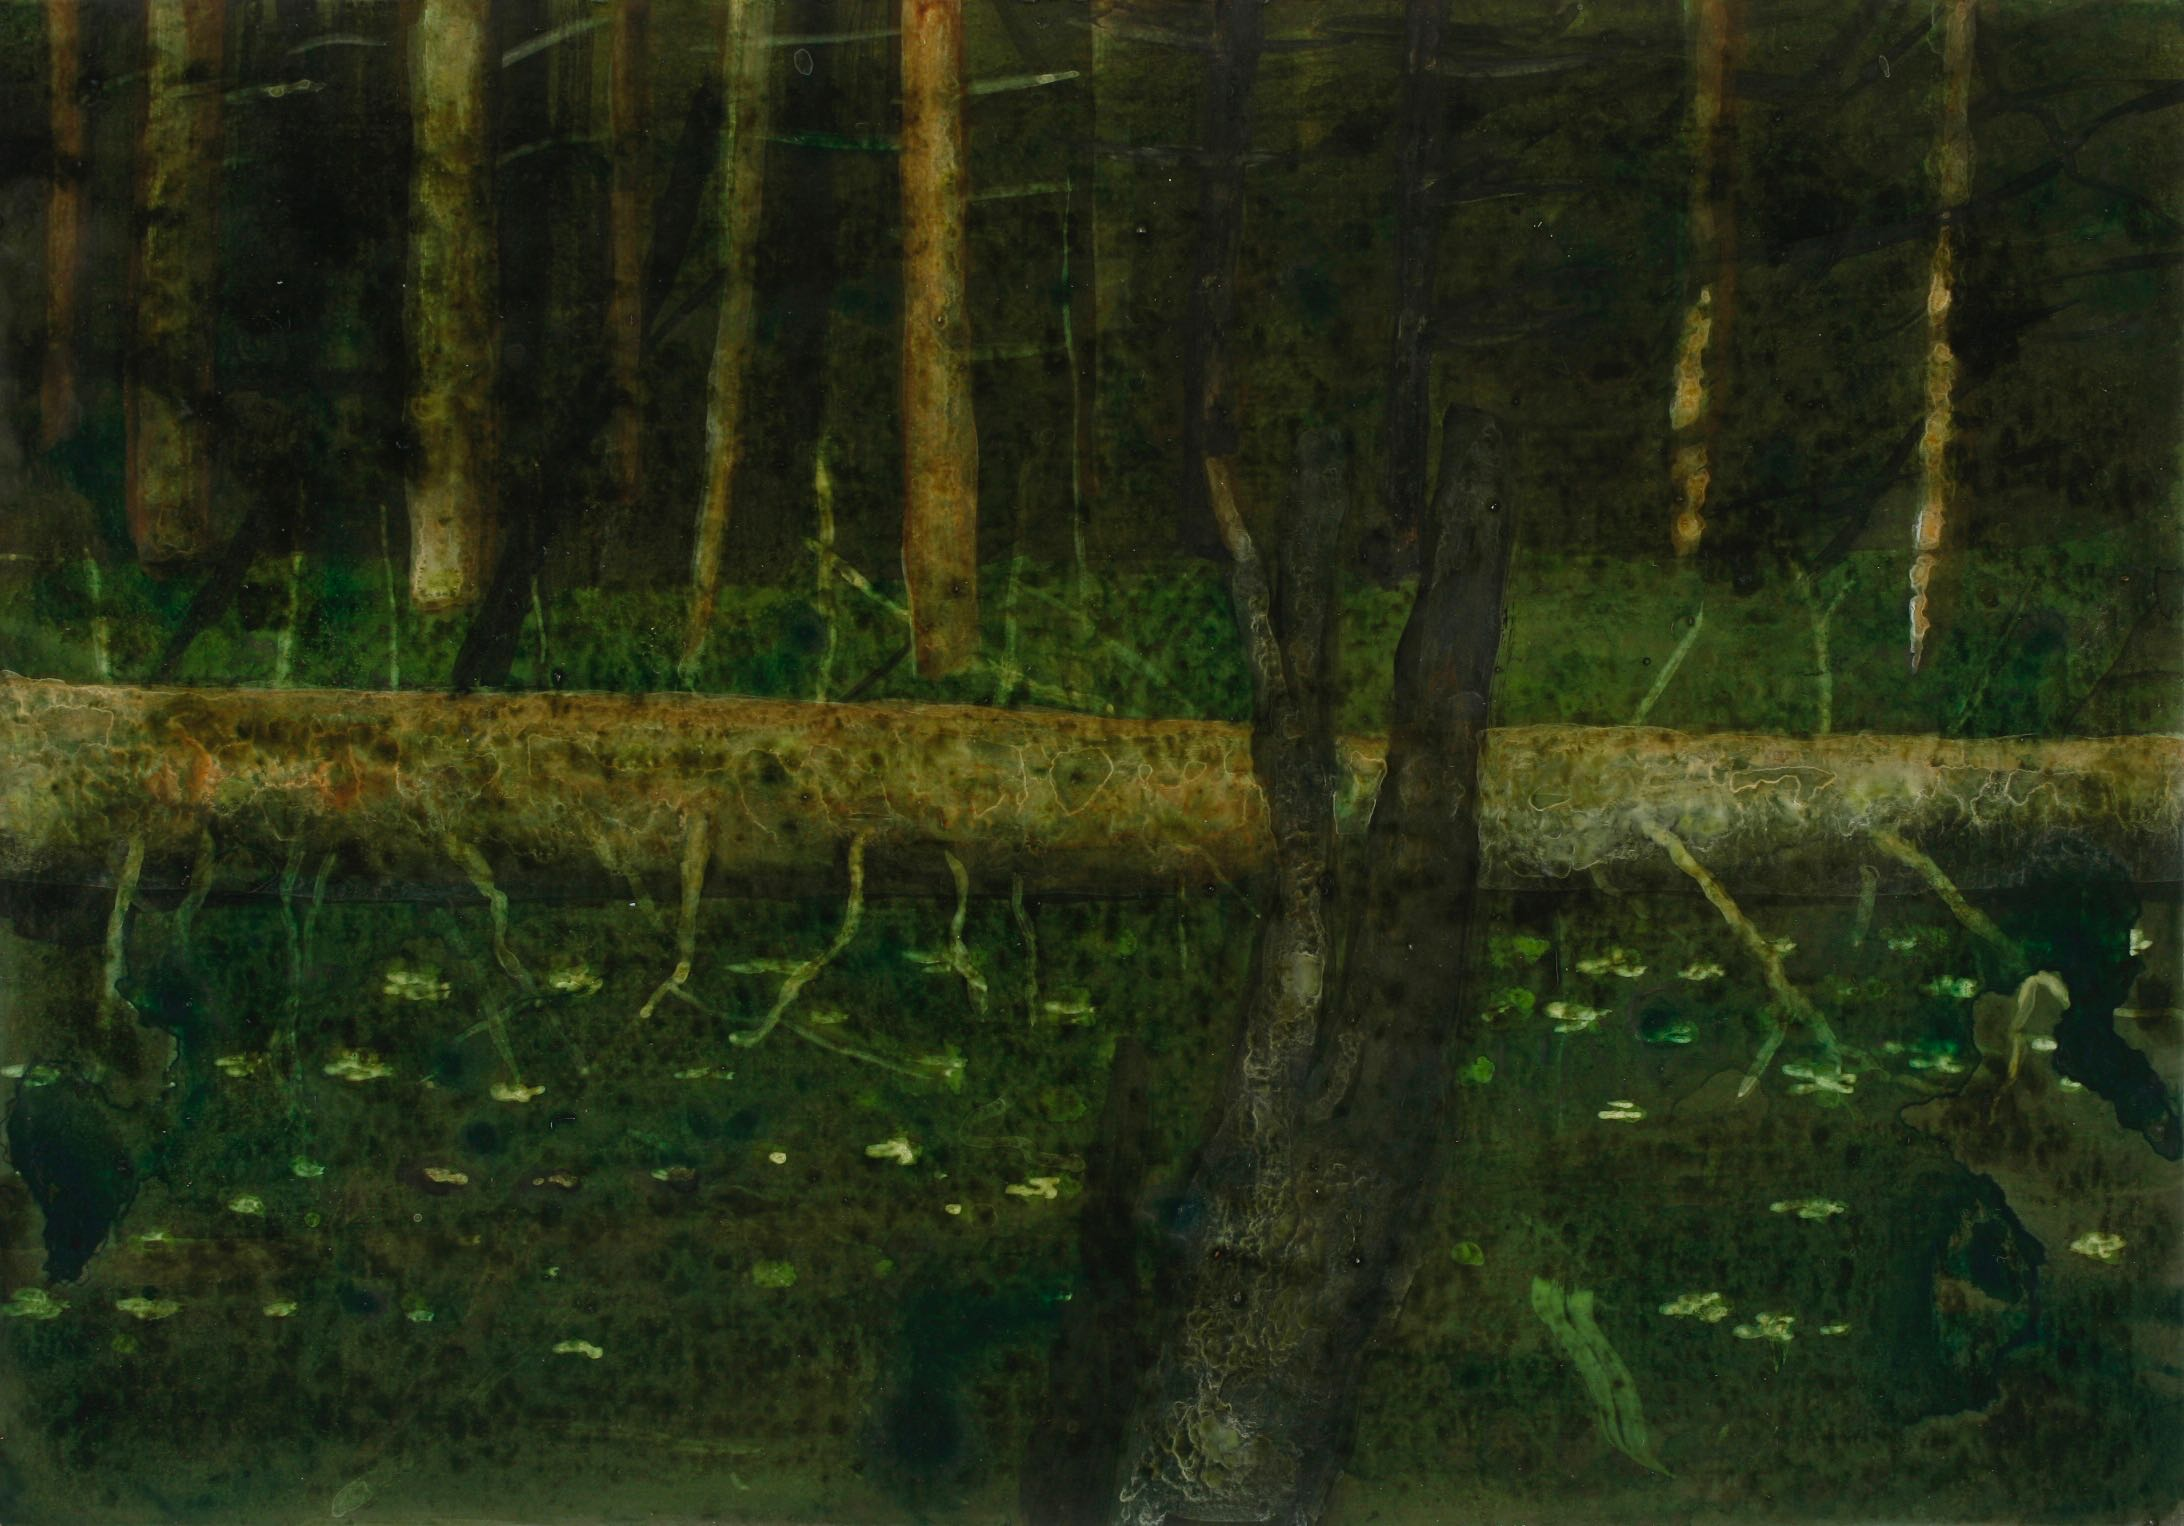 Skisse, skoglandskap  17,5x25,5cm akryl/tusj på kartong 2007